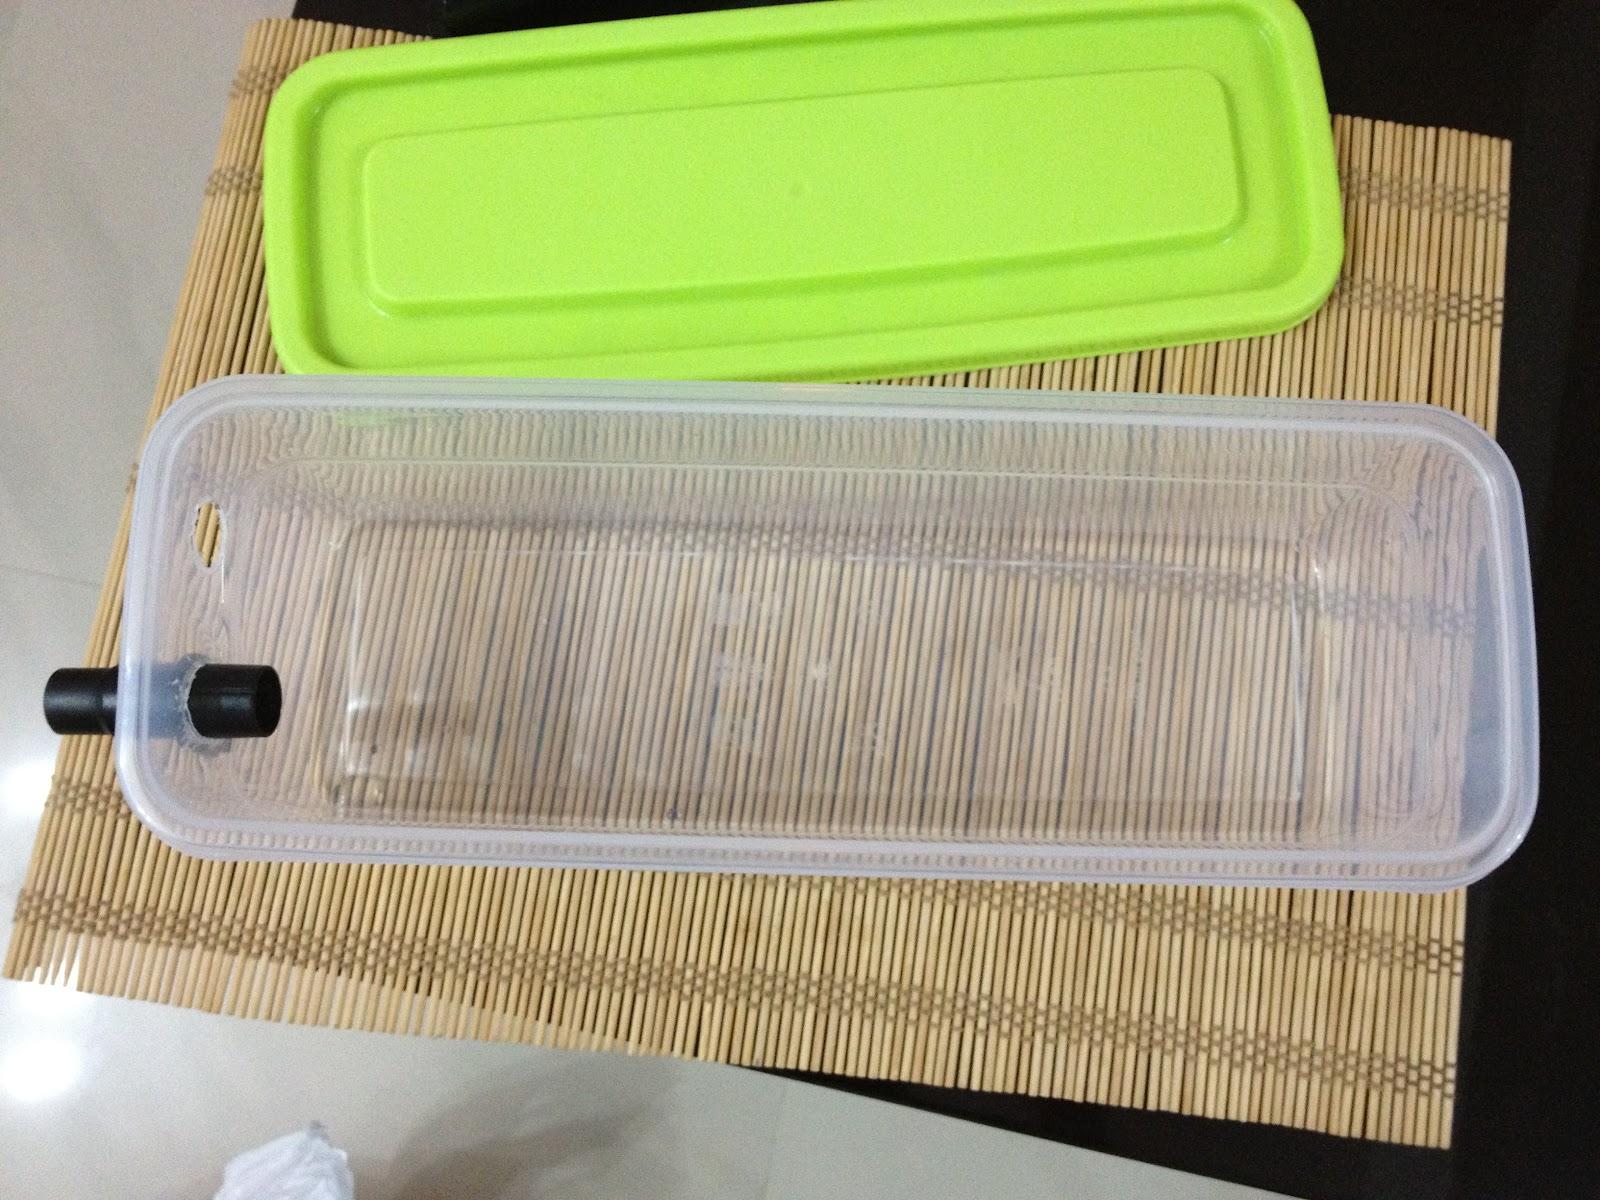 Aquabie diy filter box for Fish tank filter homemade